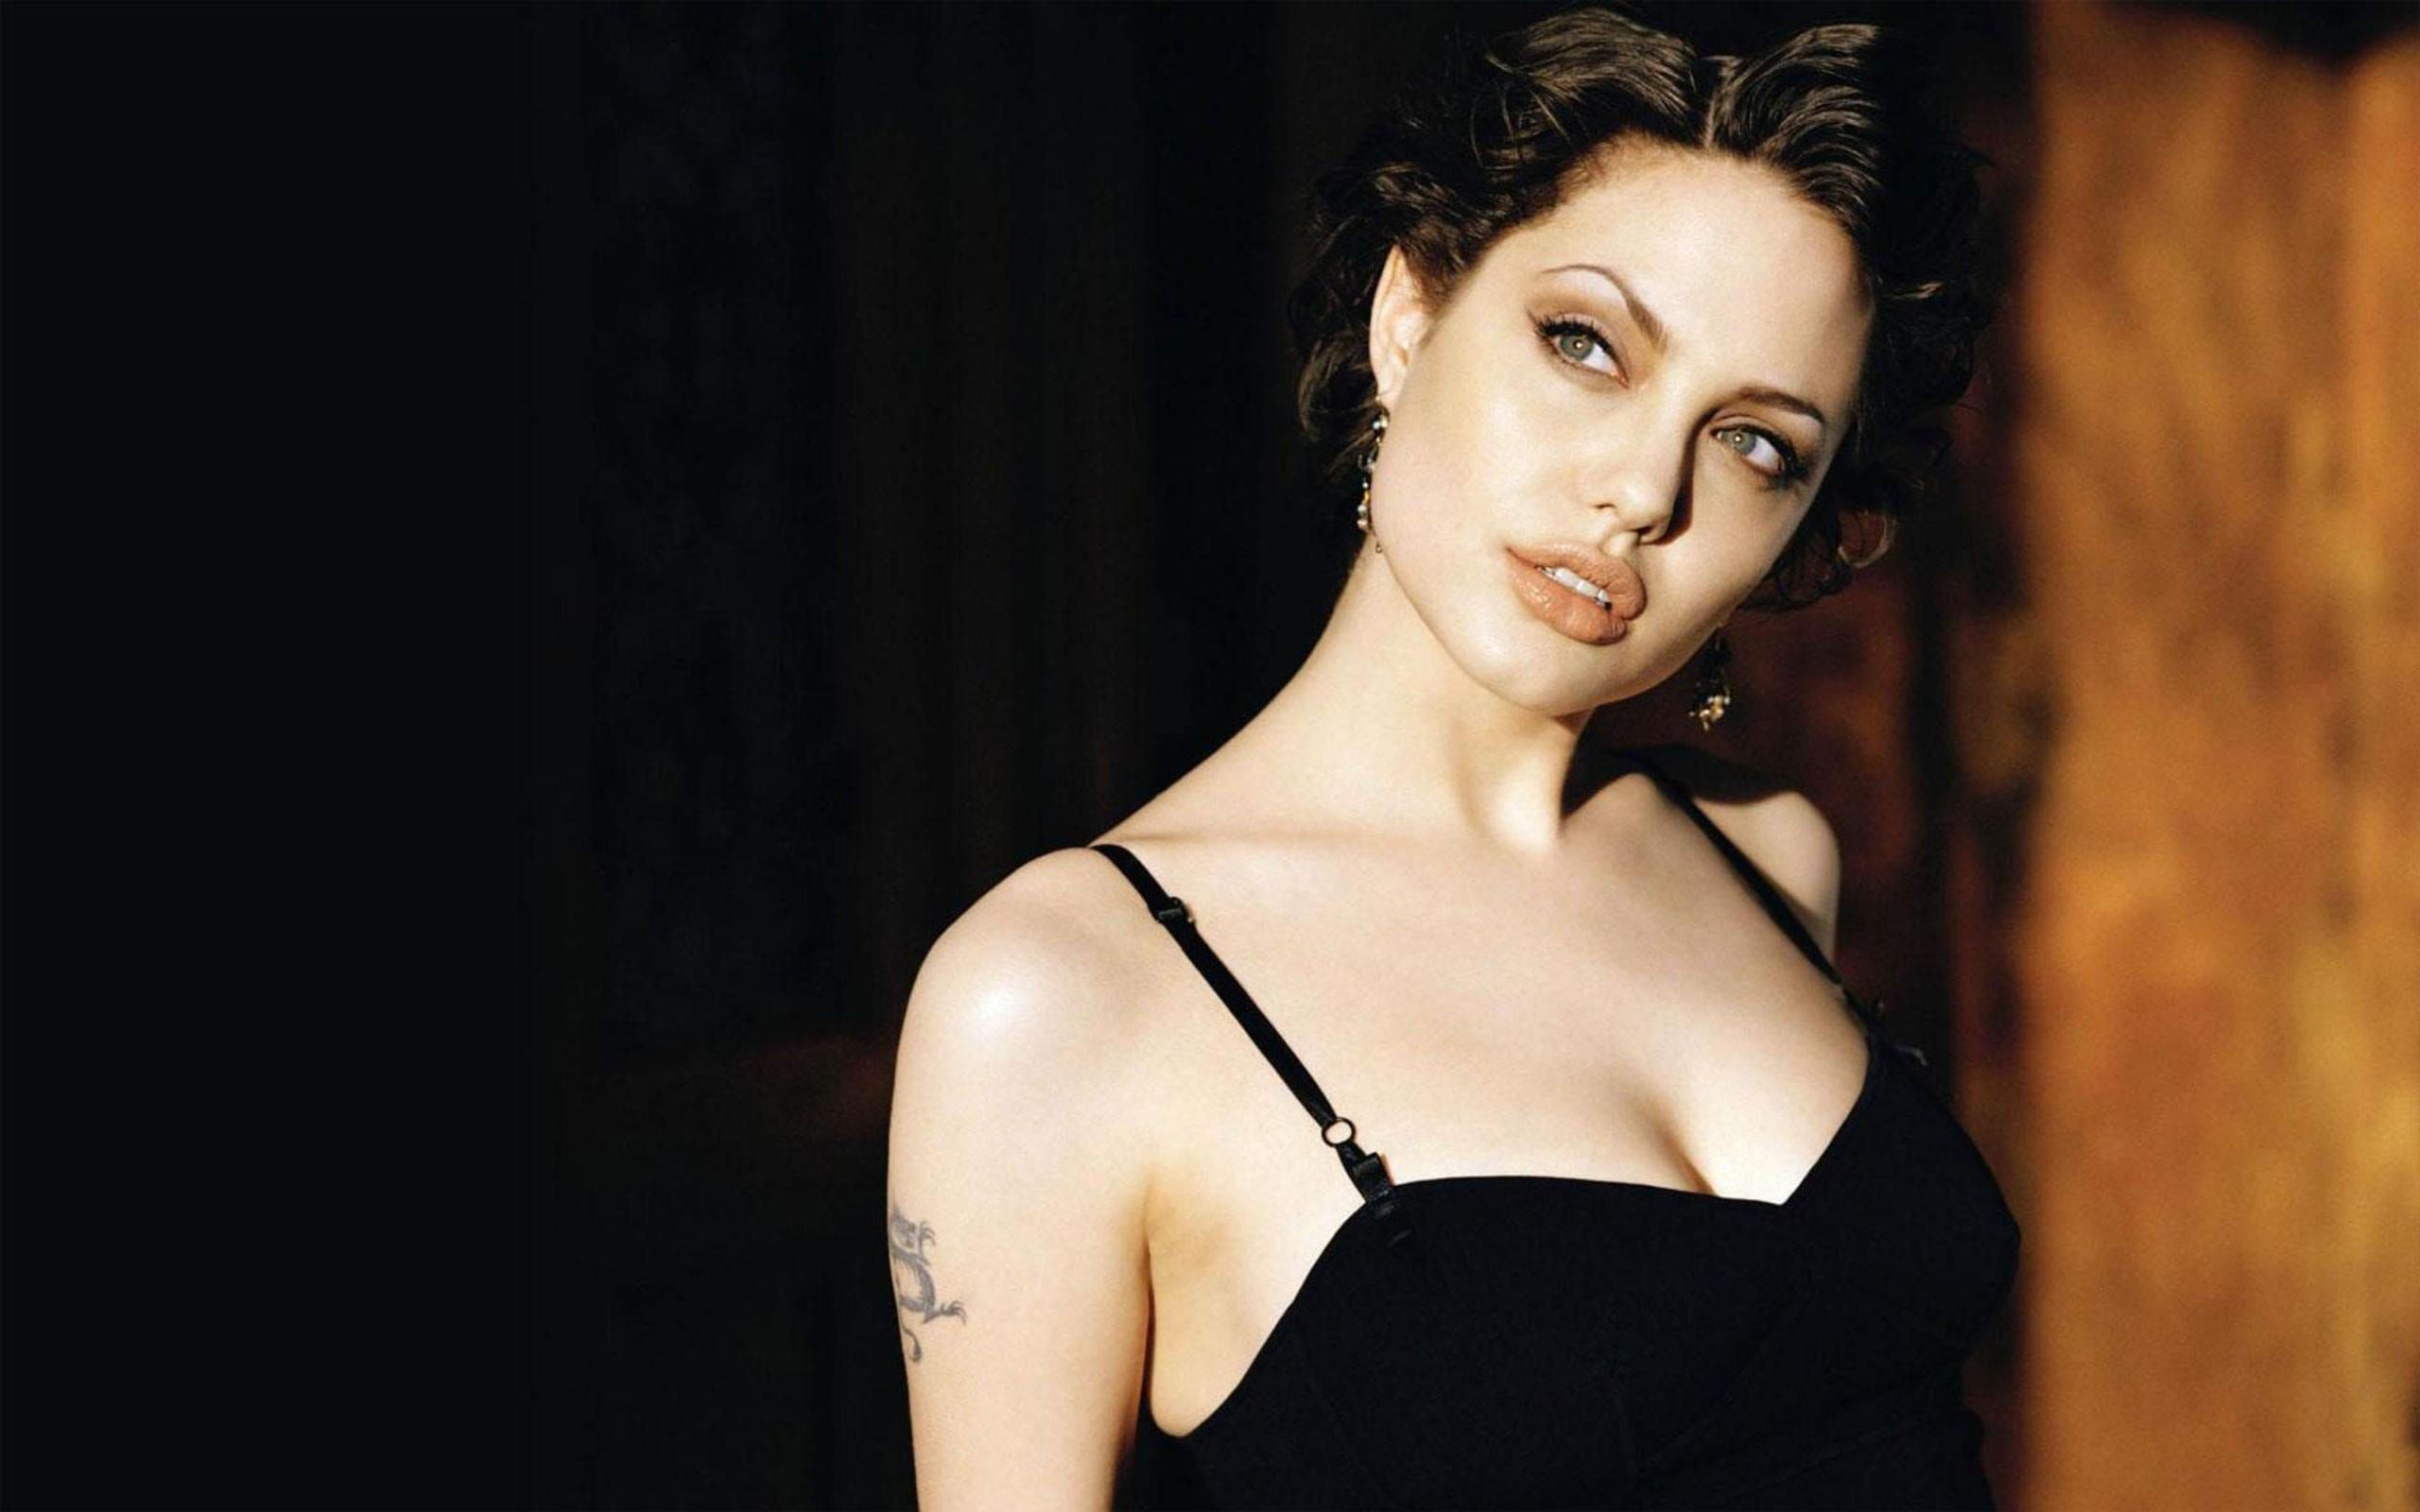 Angelina Jolie Hot Stills actress angelina jolie hot hd wallpapers pictures hd walls